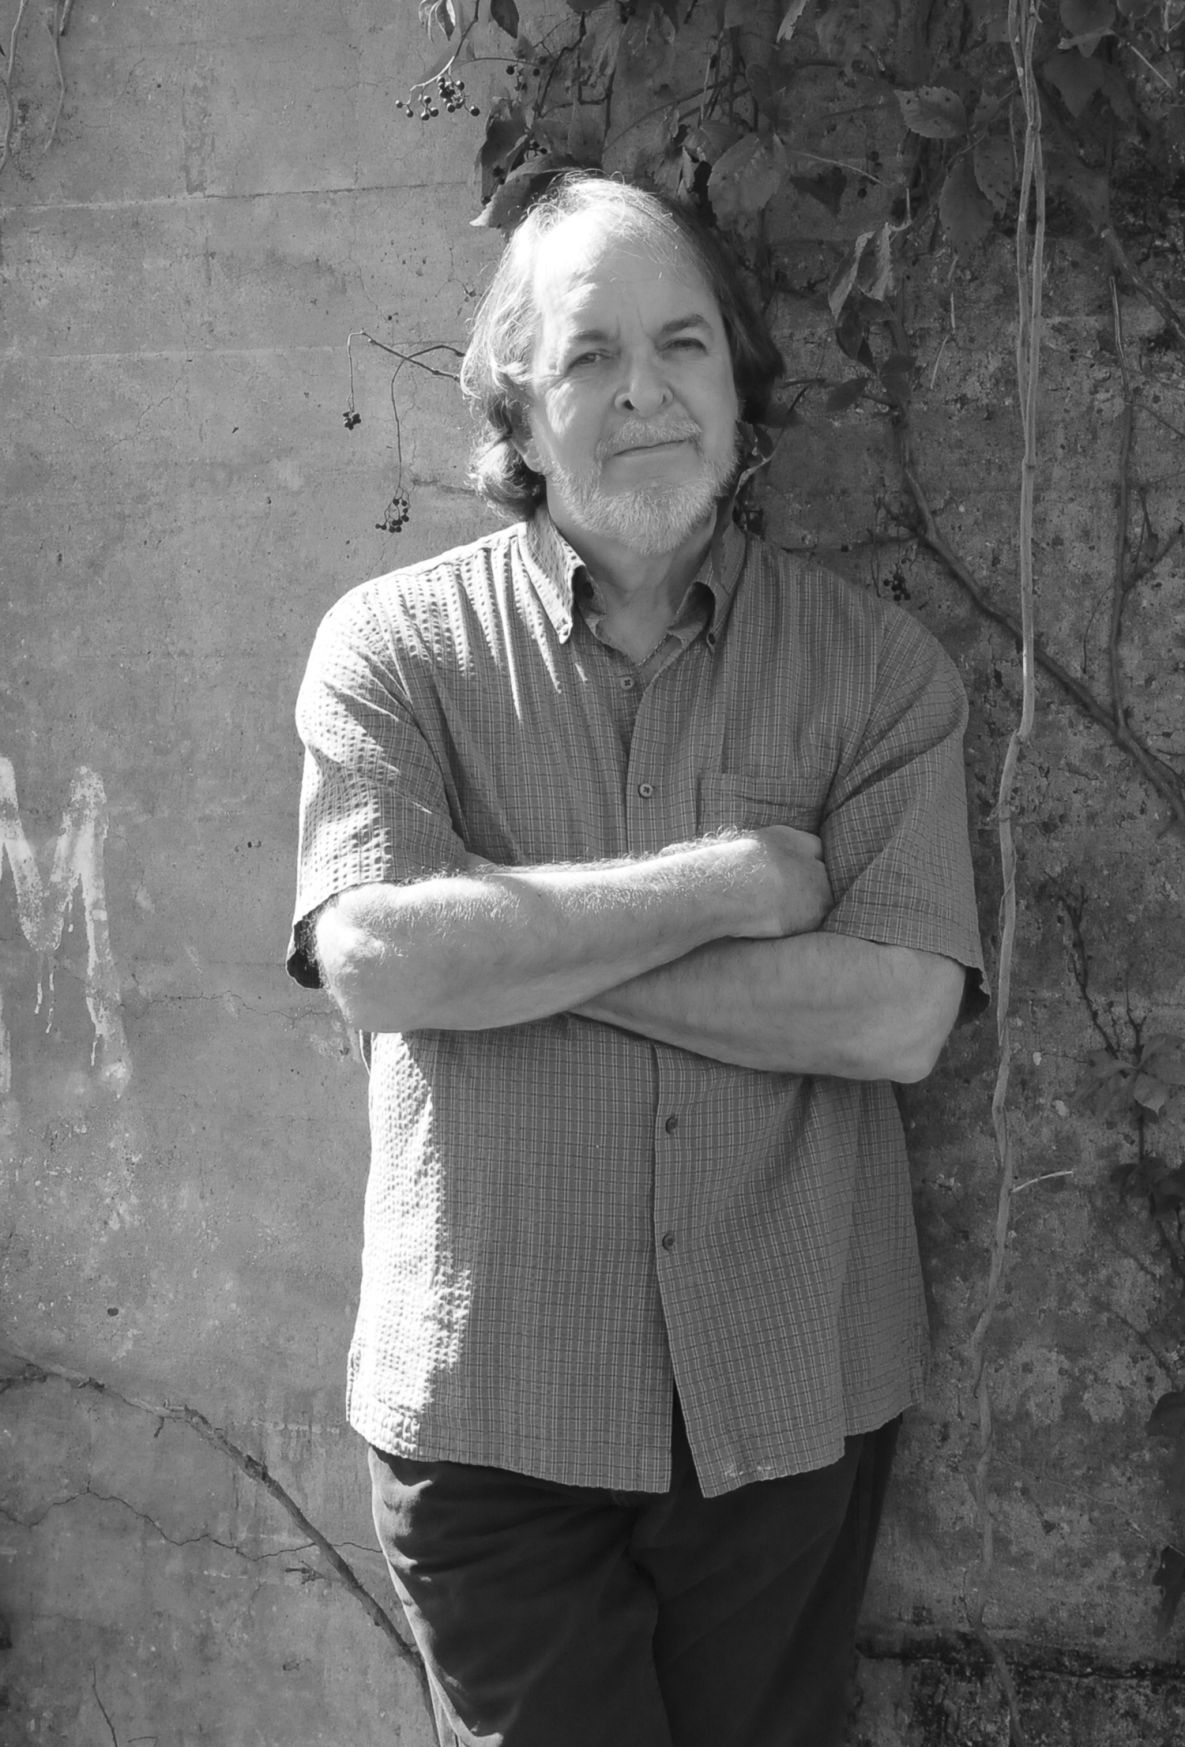 Poet John Griffin returns to read from Meltdown